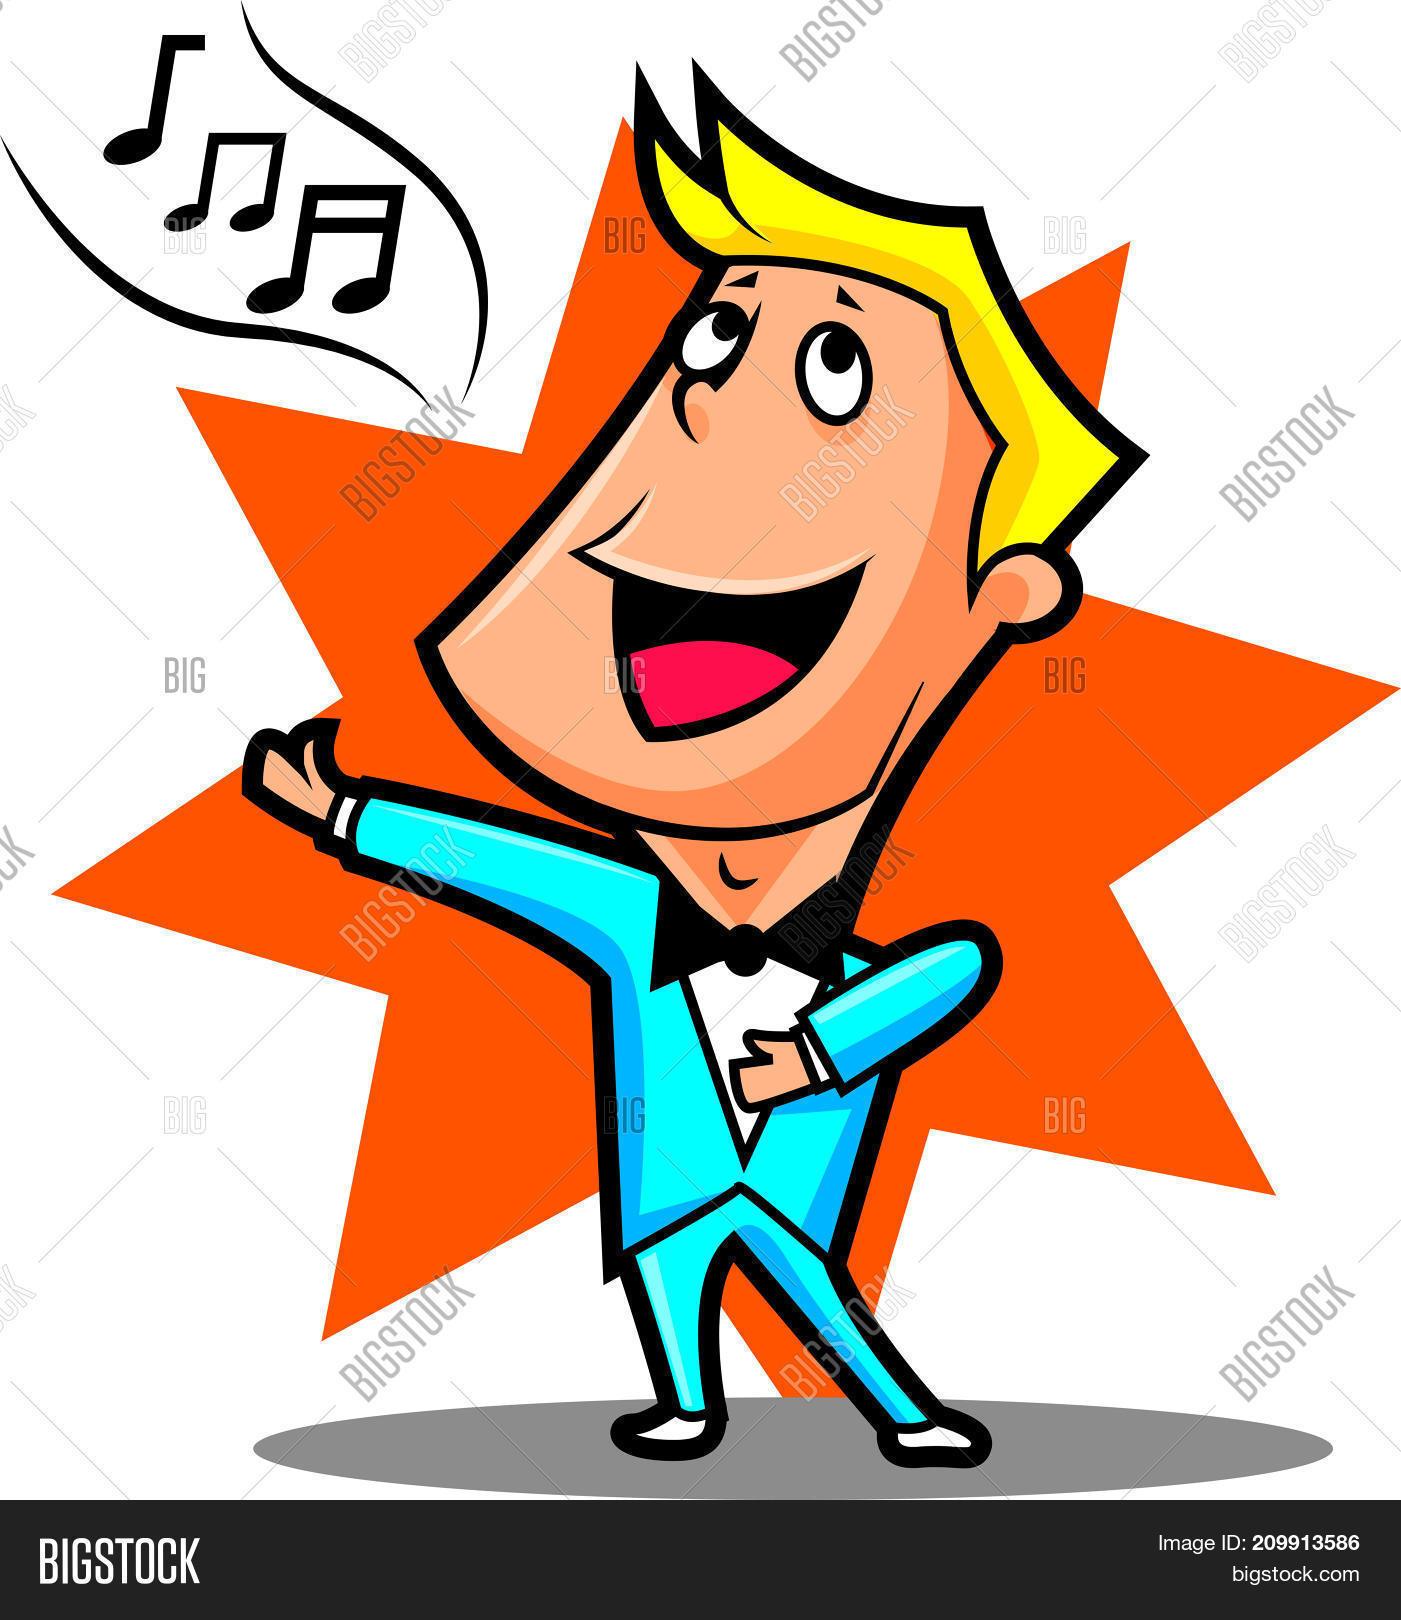 Cartoon Male Superstar Singer Vector & Photo | Bigstock